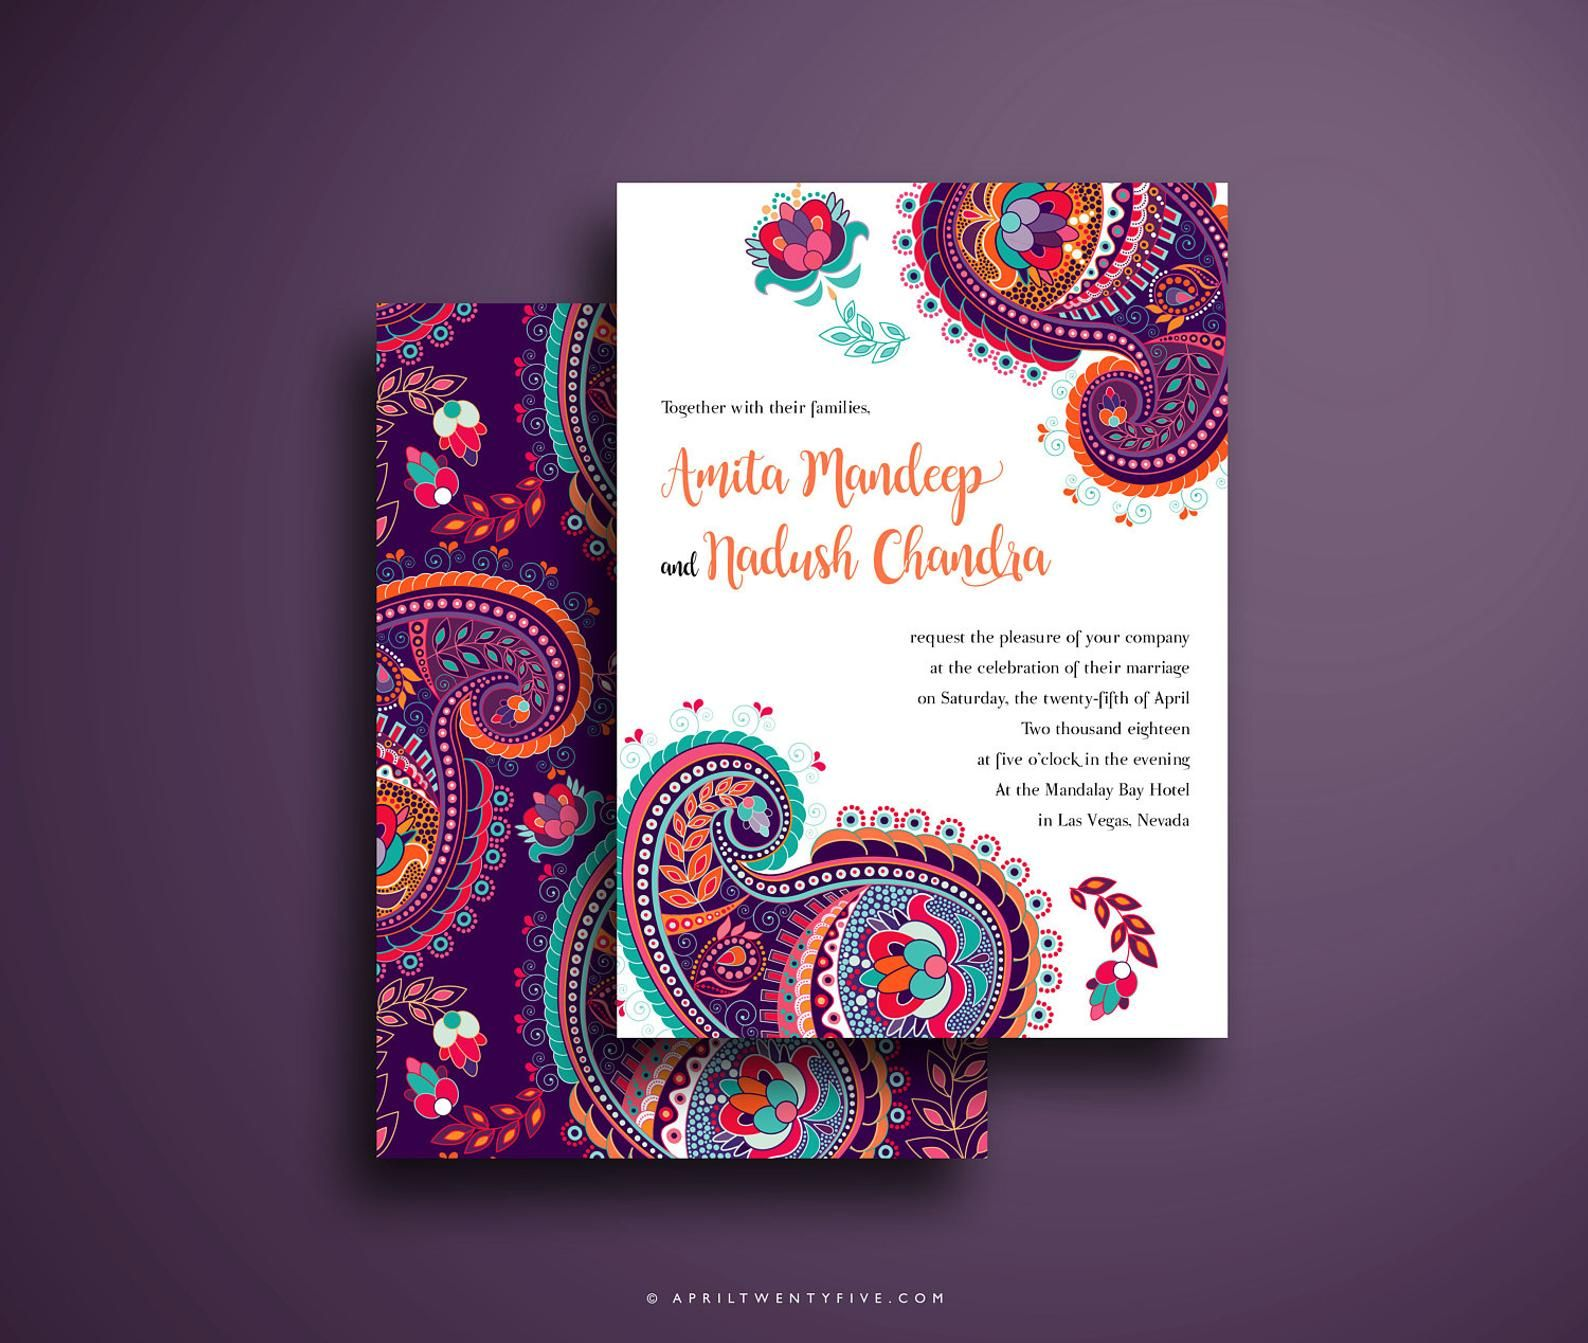 Amita Diy Indian Wedding Invitation Colorful And Festive Pink Purple Turquoise And Orange Paisley Digital Download In 2021 Indian Wedding Invitations Indian Wedding Invitation Cards Indian Invitations